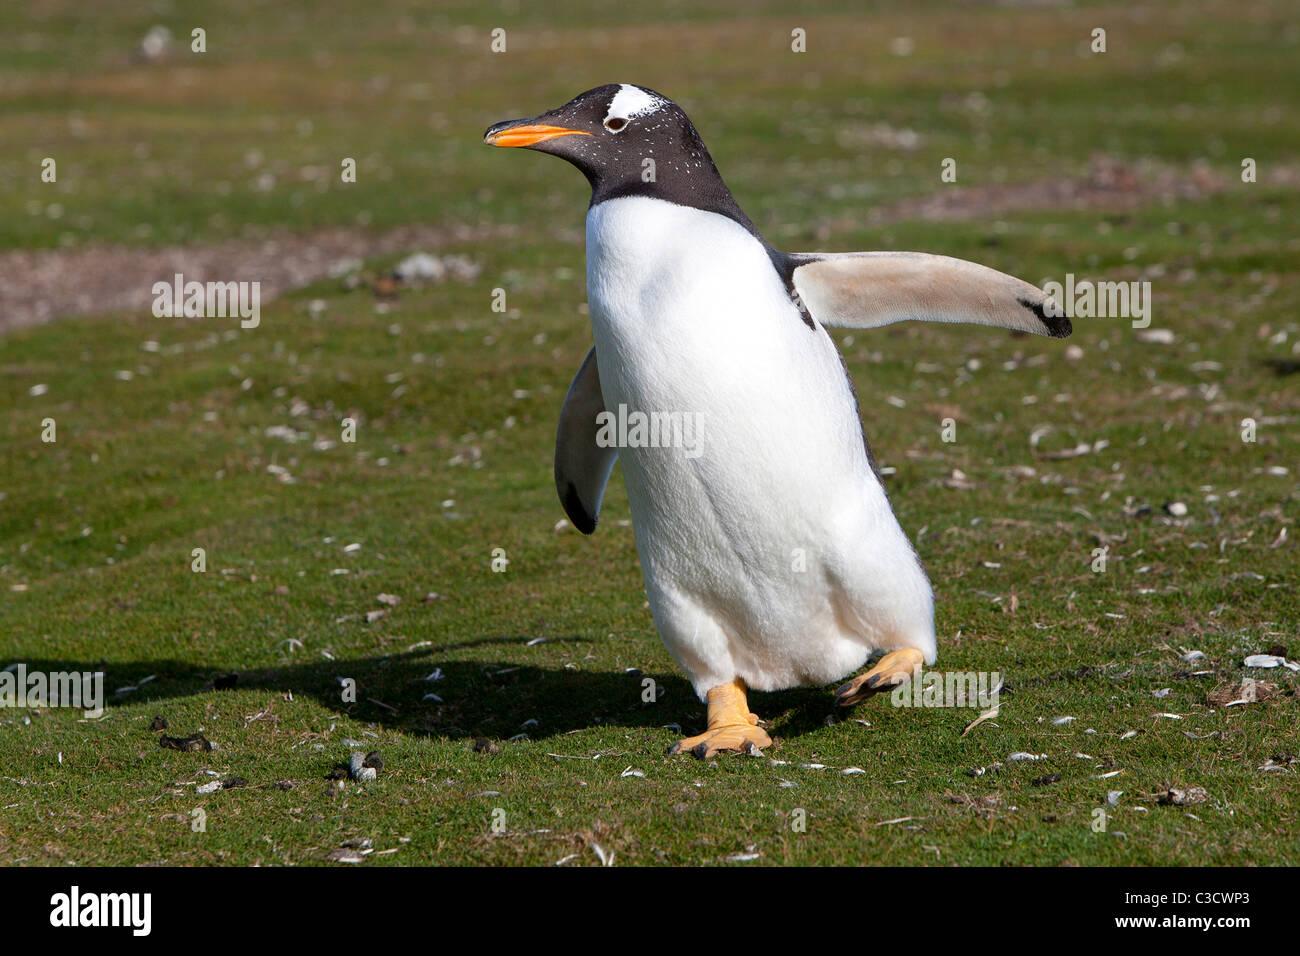 Gentoo Penguin (Pygoscelis papua), running. Sea Lion Island, Falkland Islands. - Stock Image